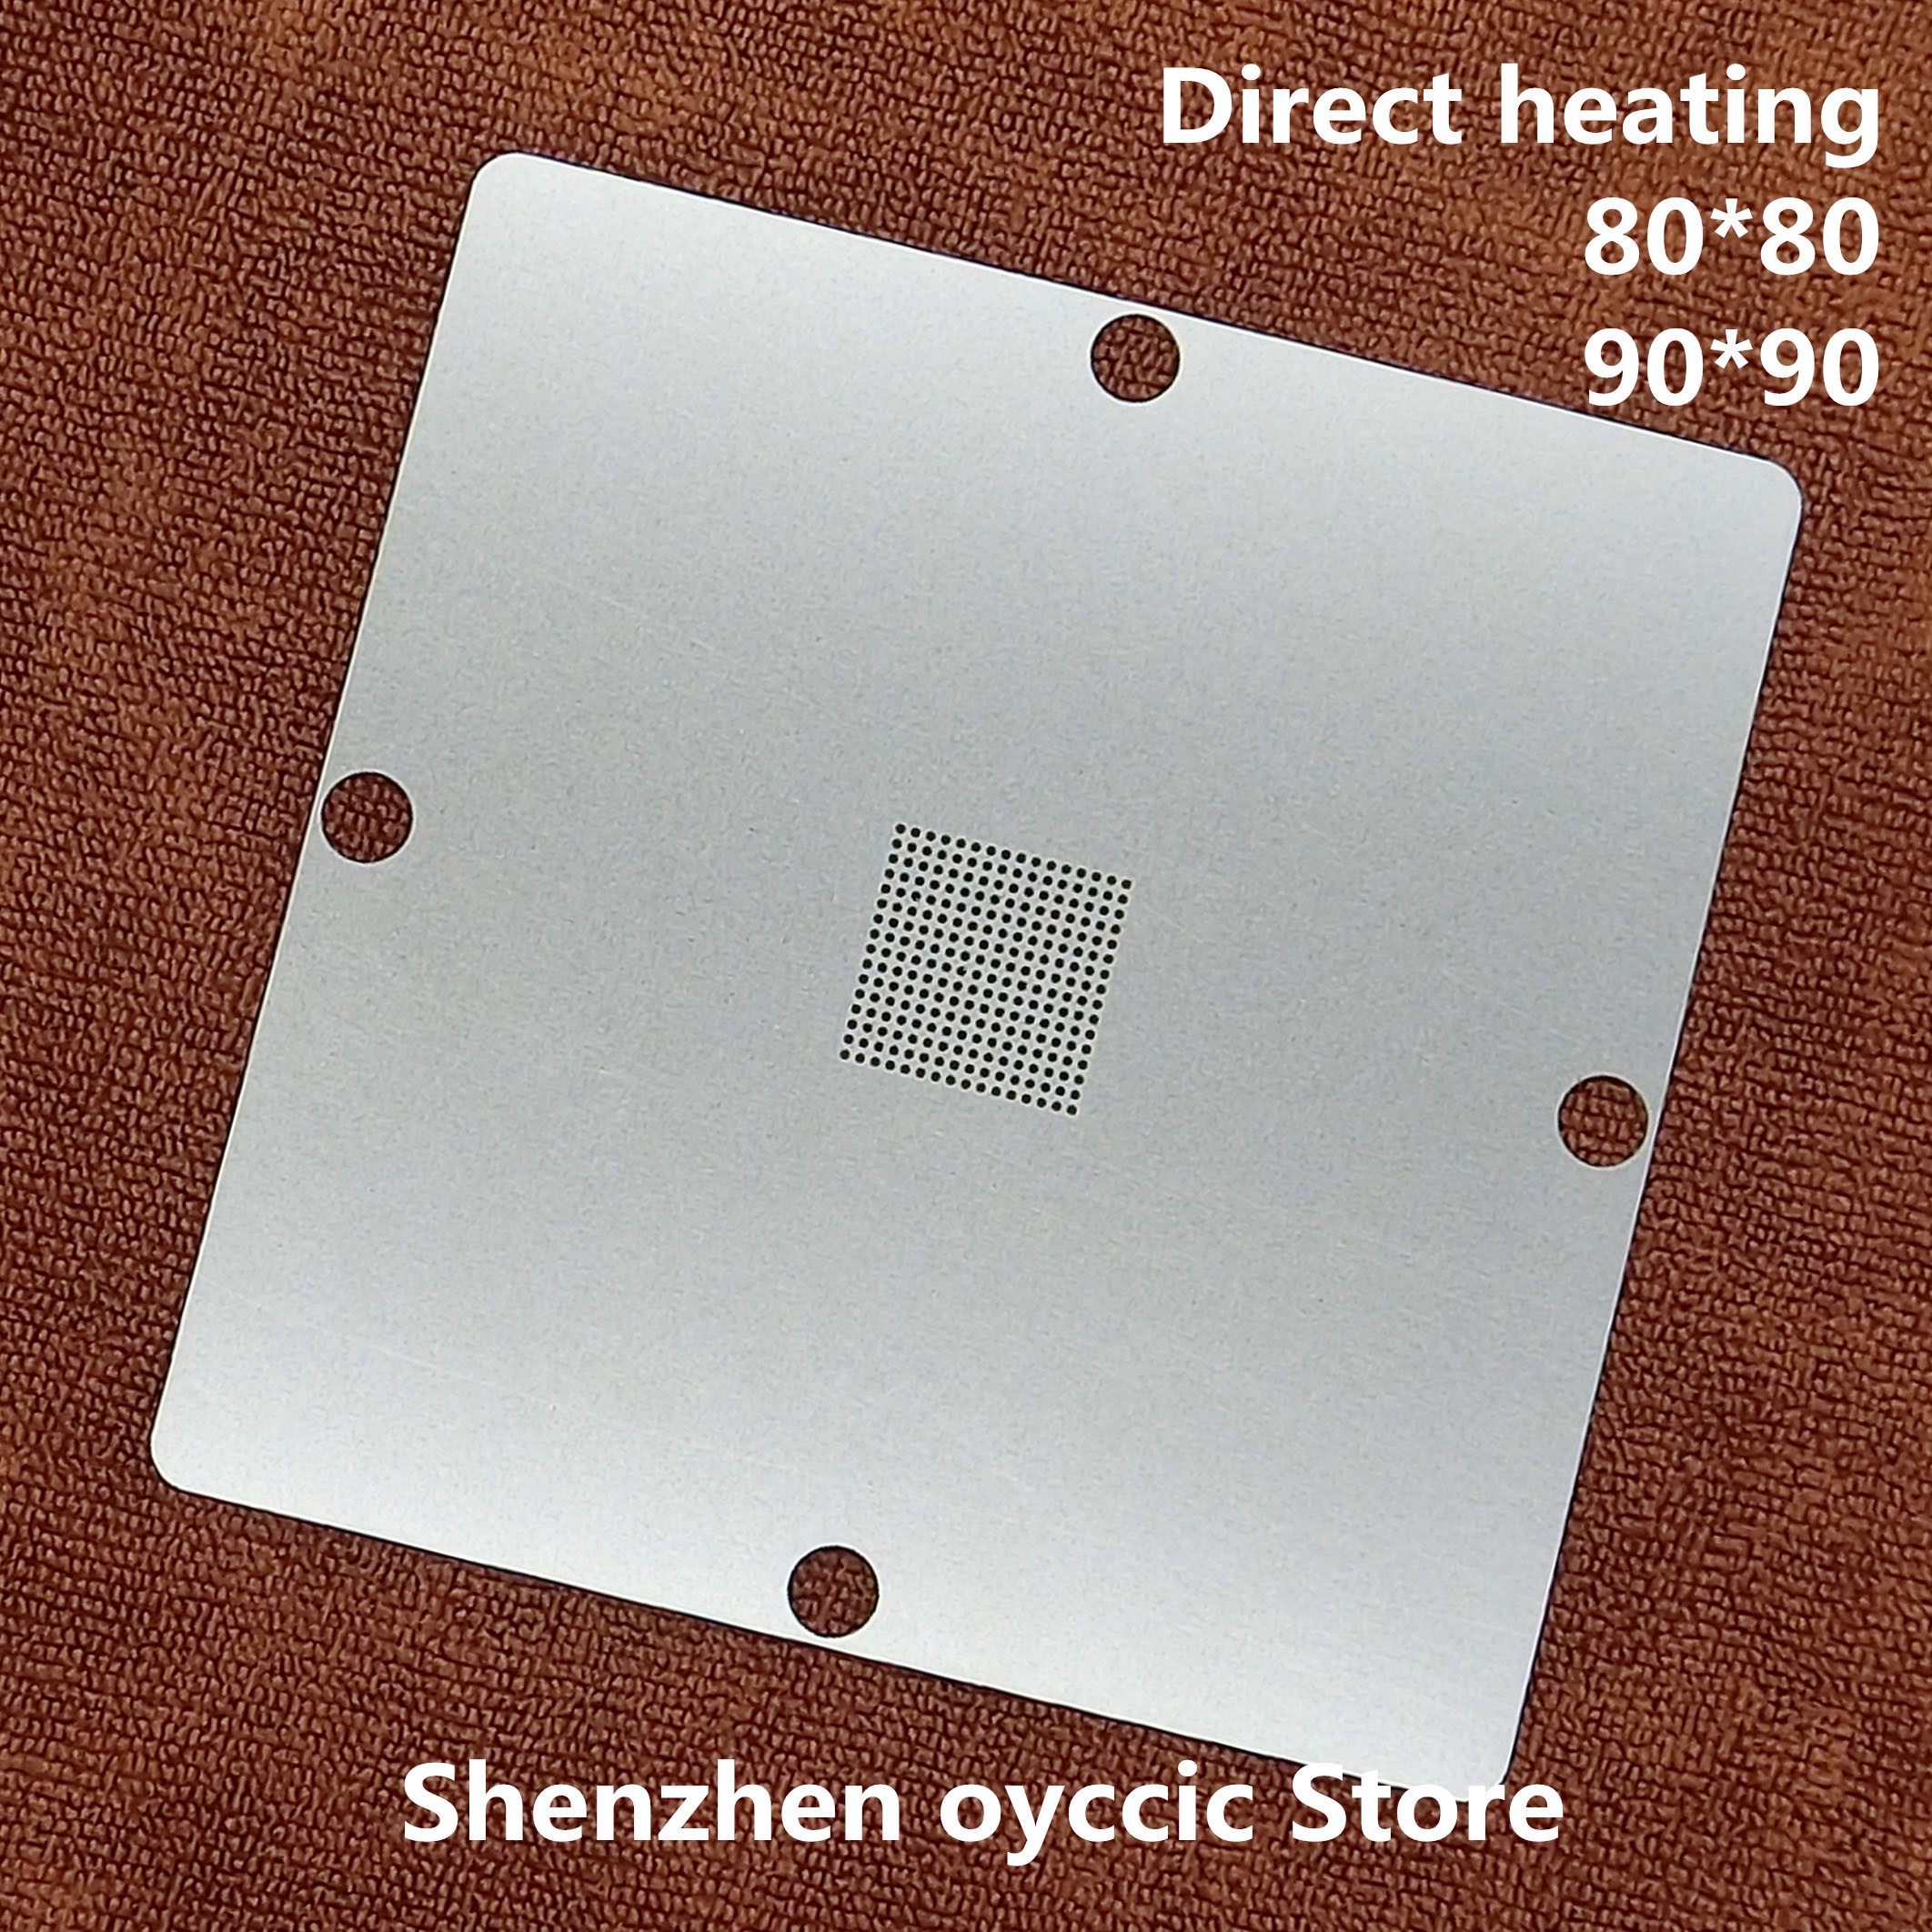 Direct heating 80*80 90*90  D830K013BZKB4  D810K013BZKB4  BGA Stencil TemplateDirect heating 80*80 90*90  D830K013BZKB4  D810K013BZKB4  BGA Stencil Template